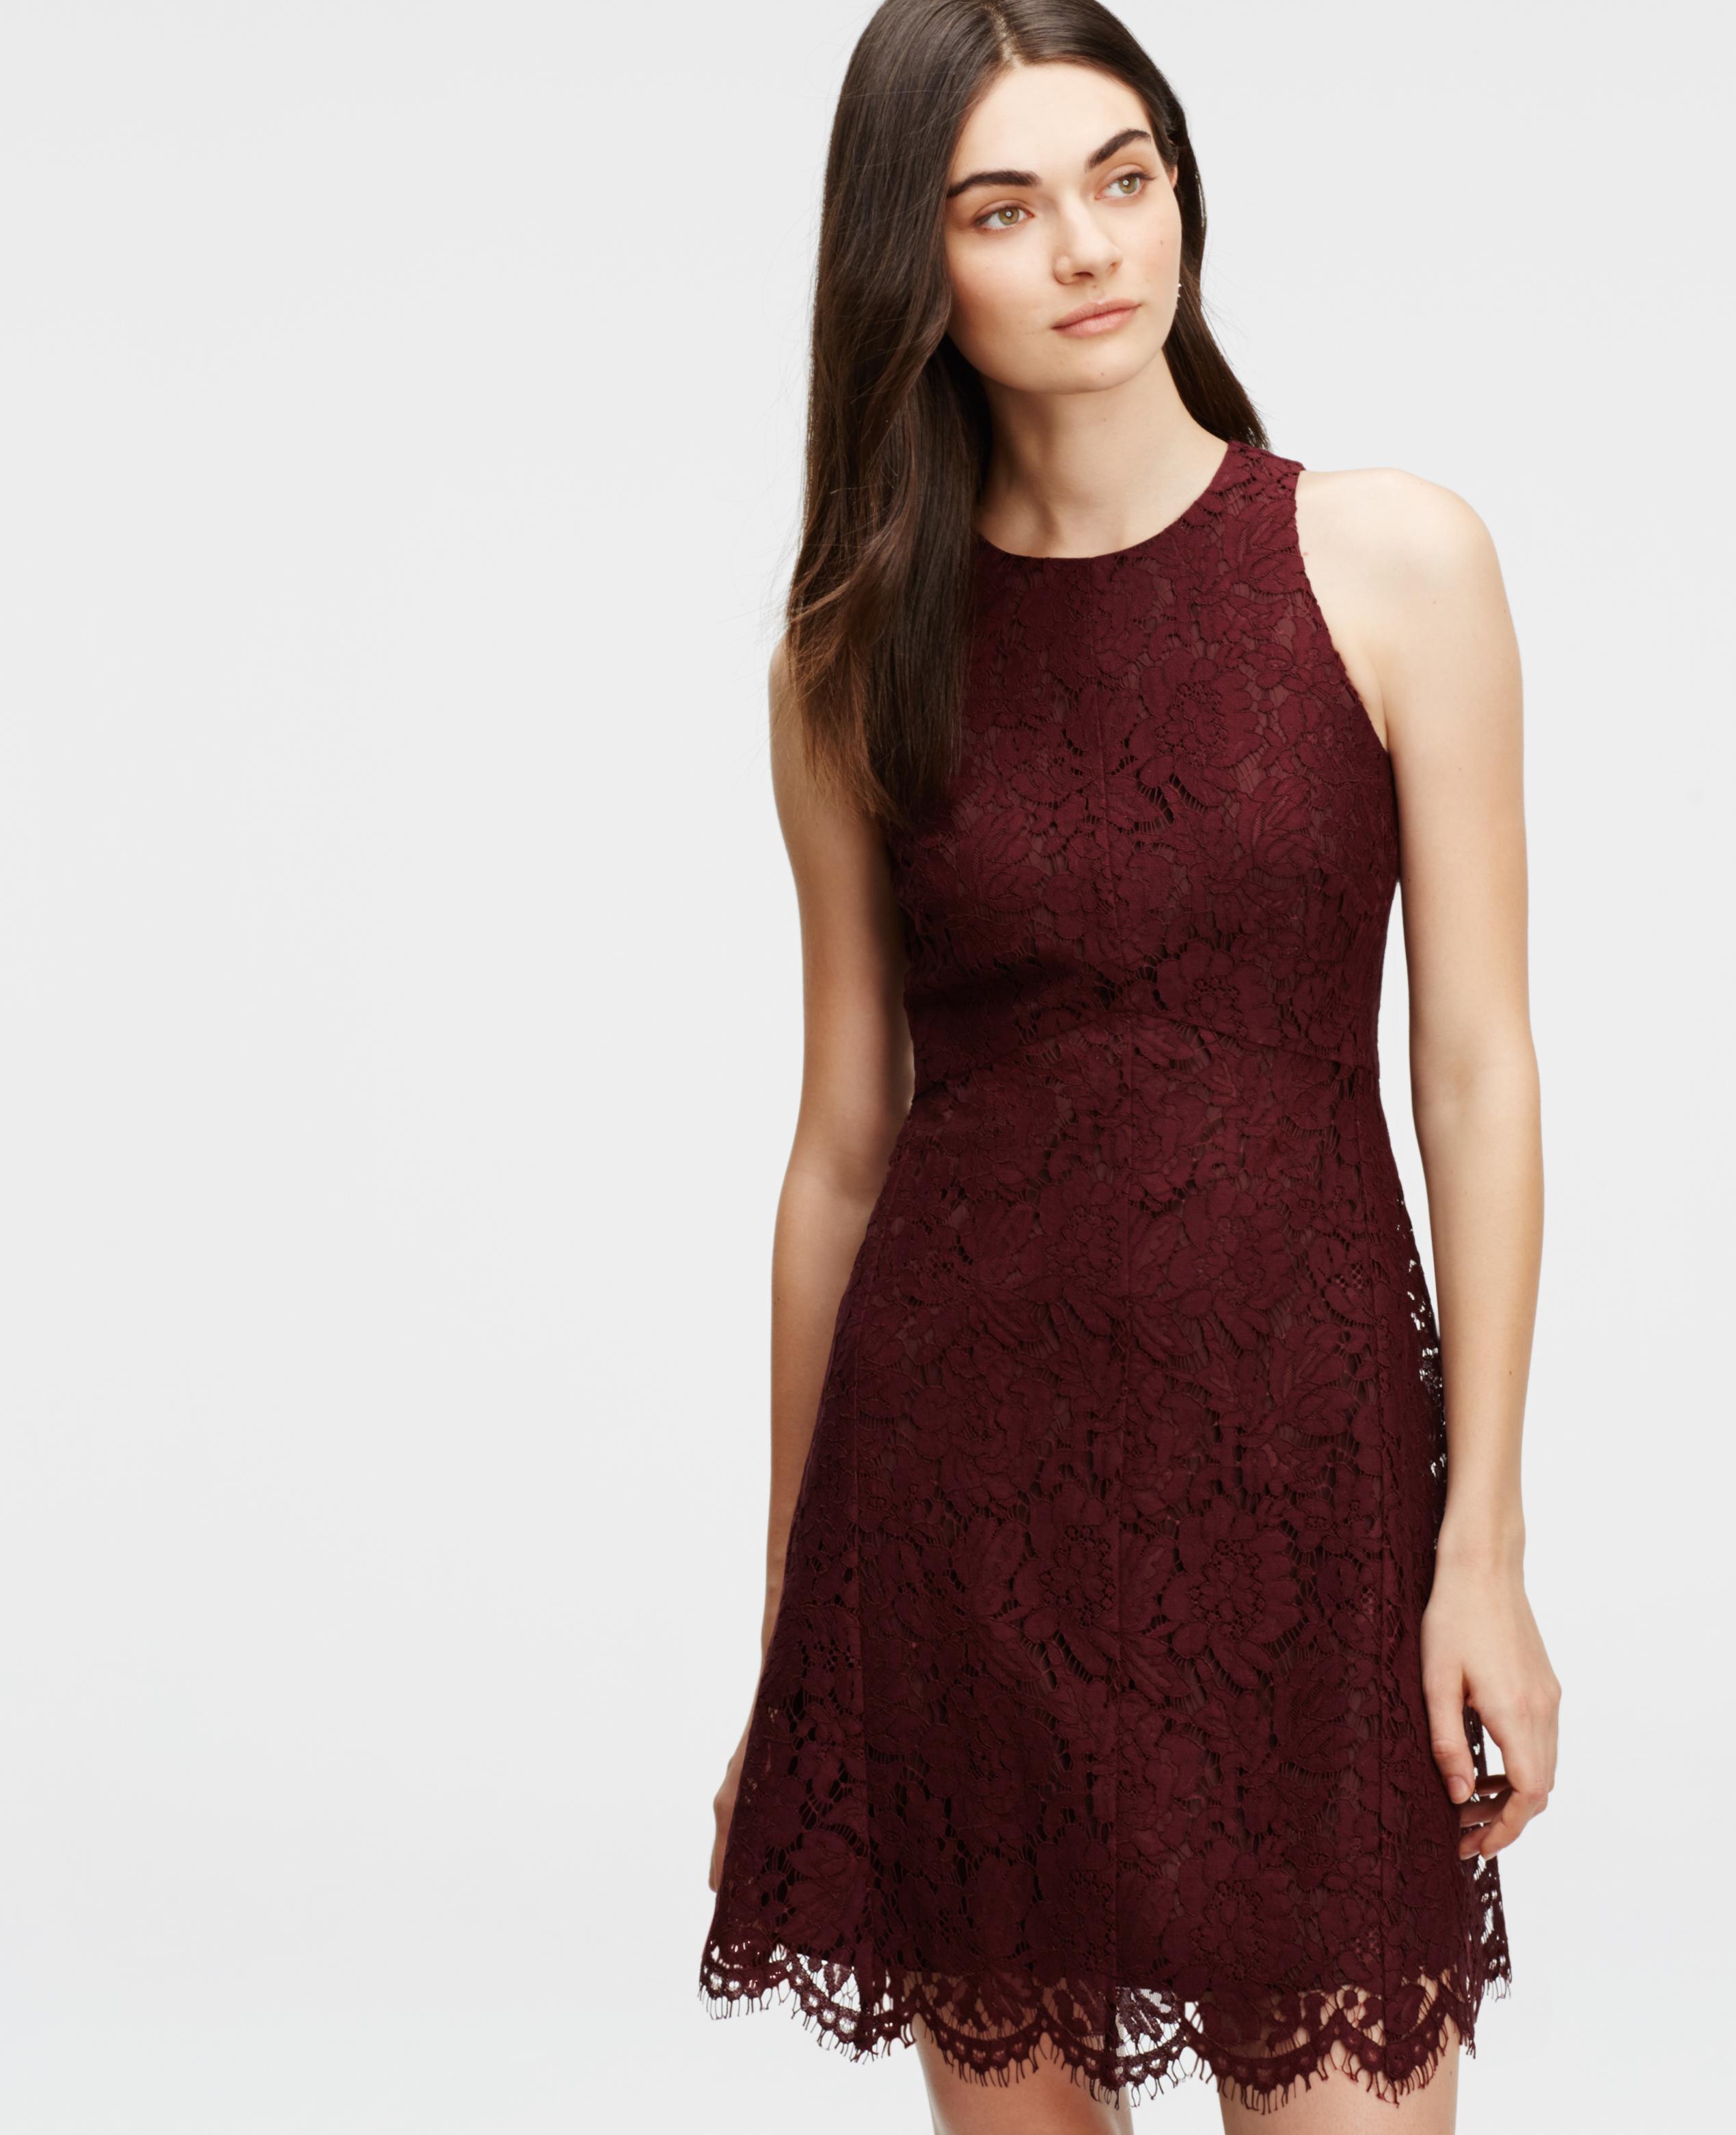 fa681796fd4c Ann Taylor Petite Lace Flare Dress in Purple - Lyst